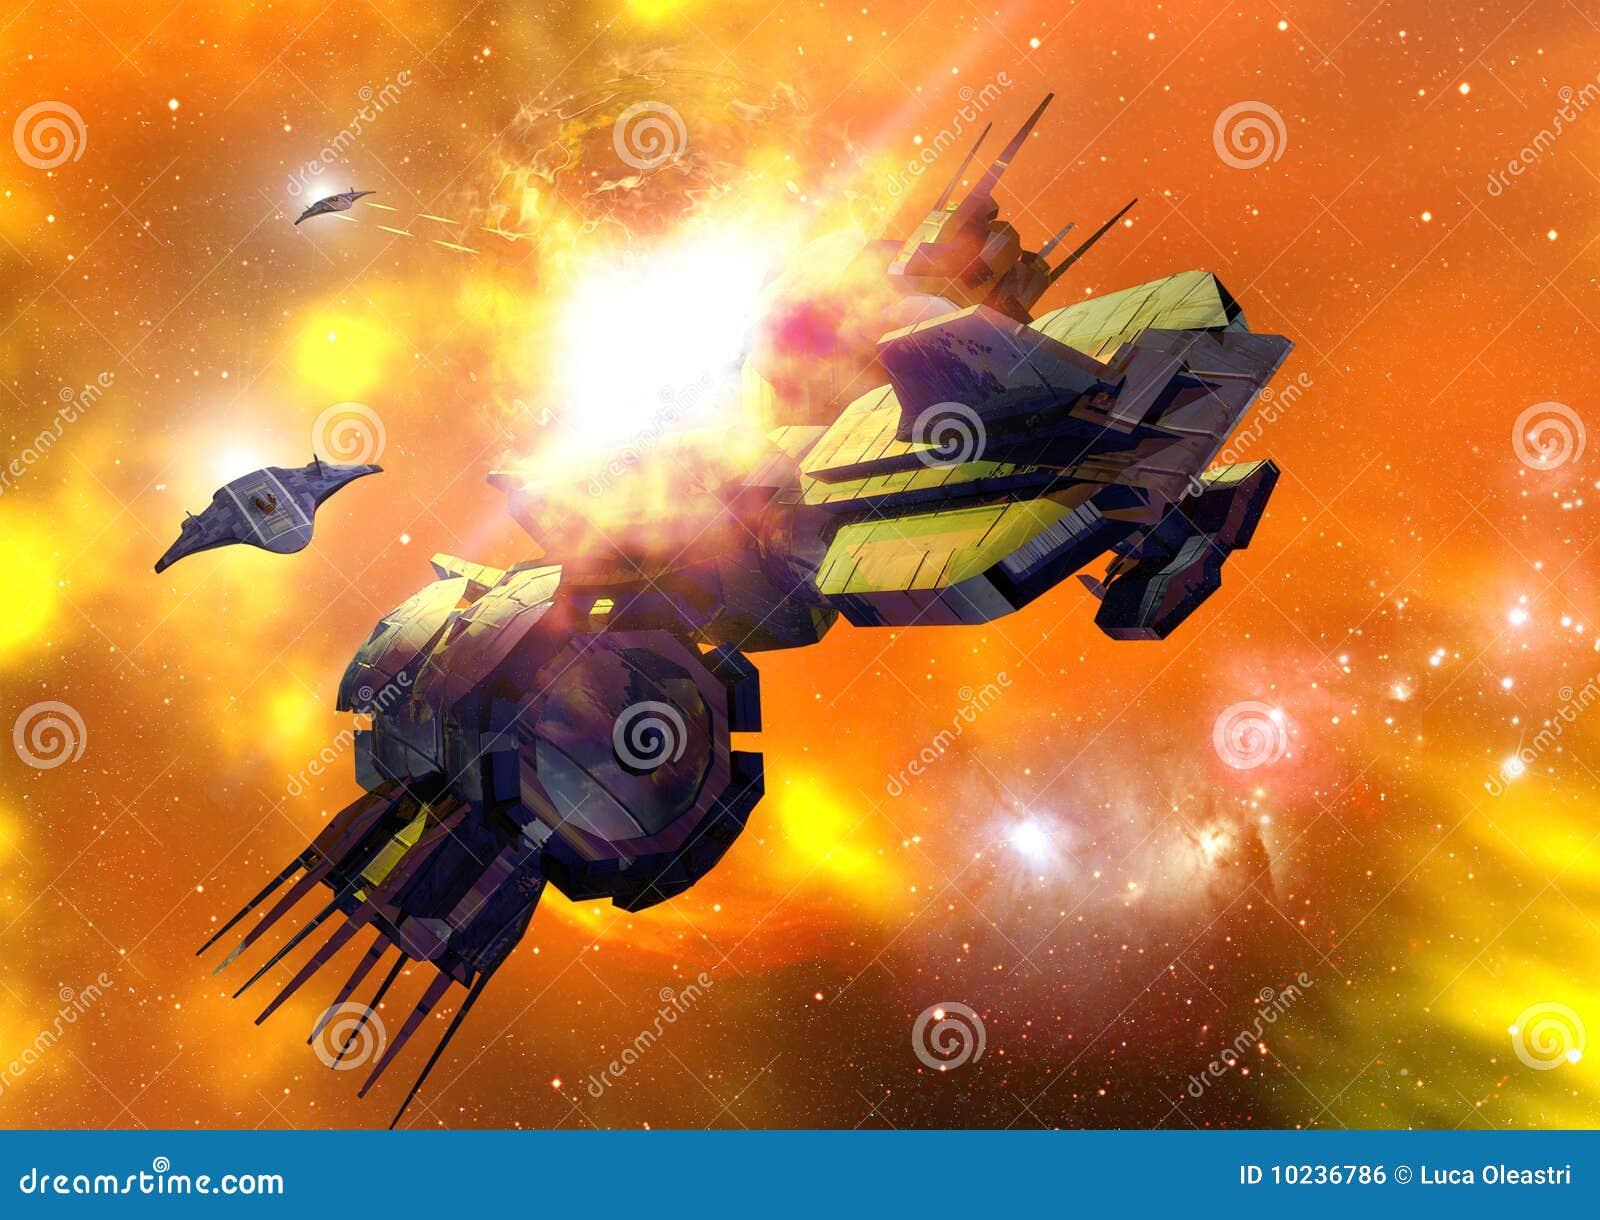 space battle stock illustration  image of globe  future